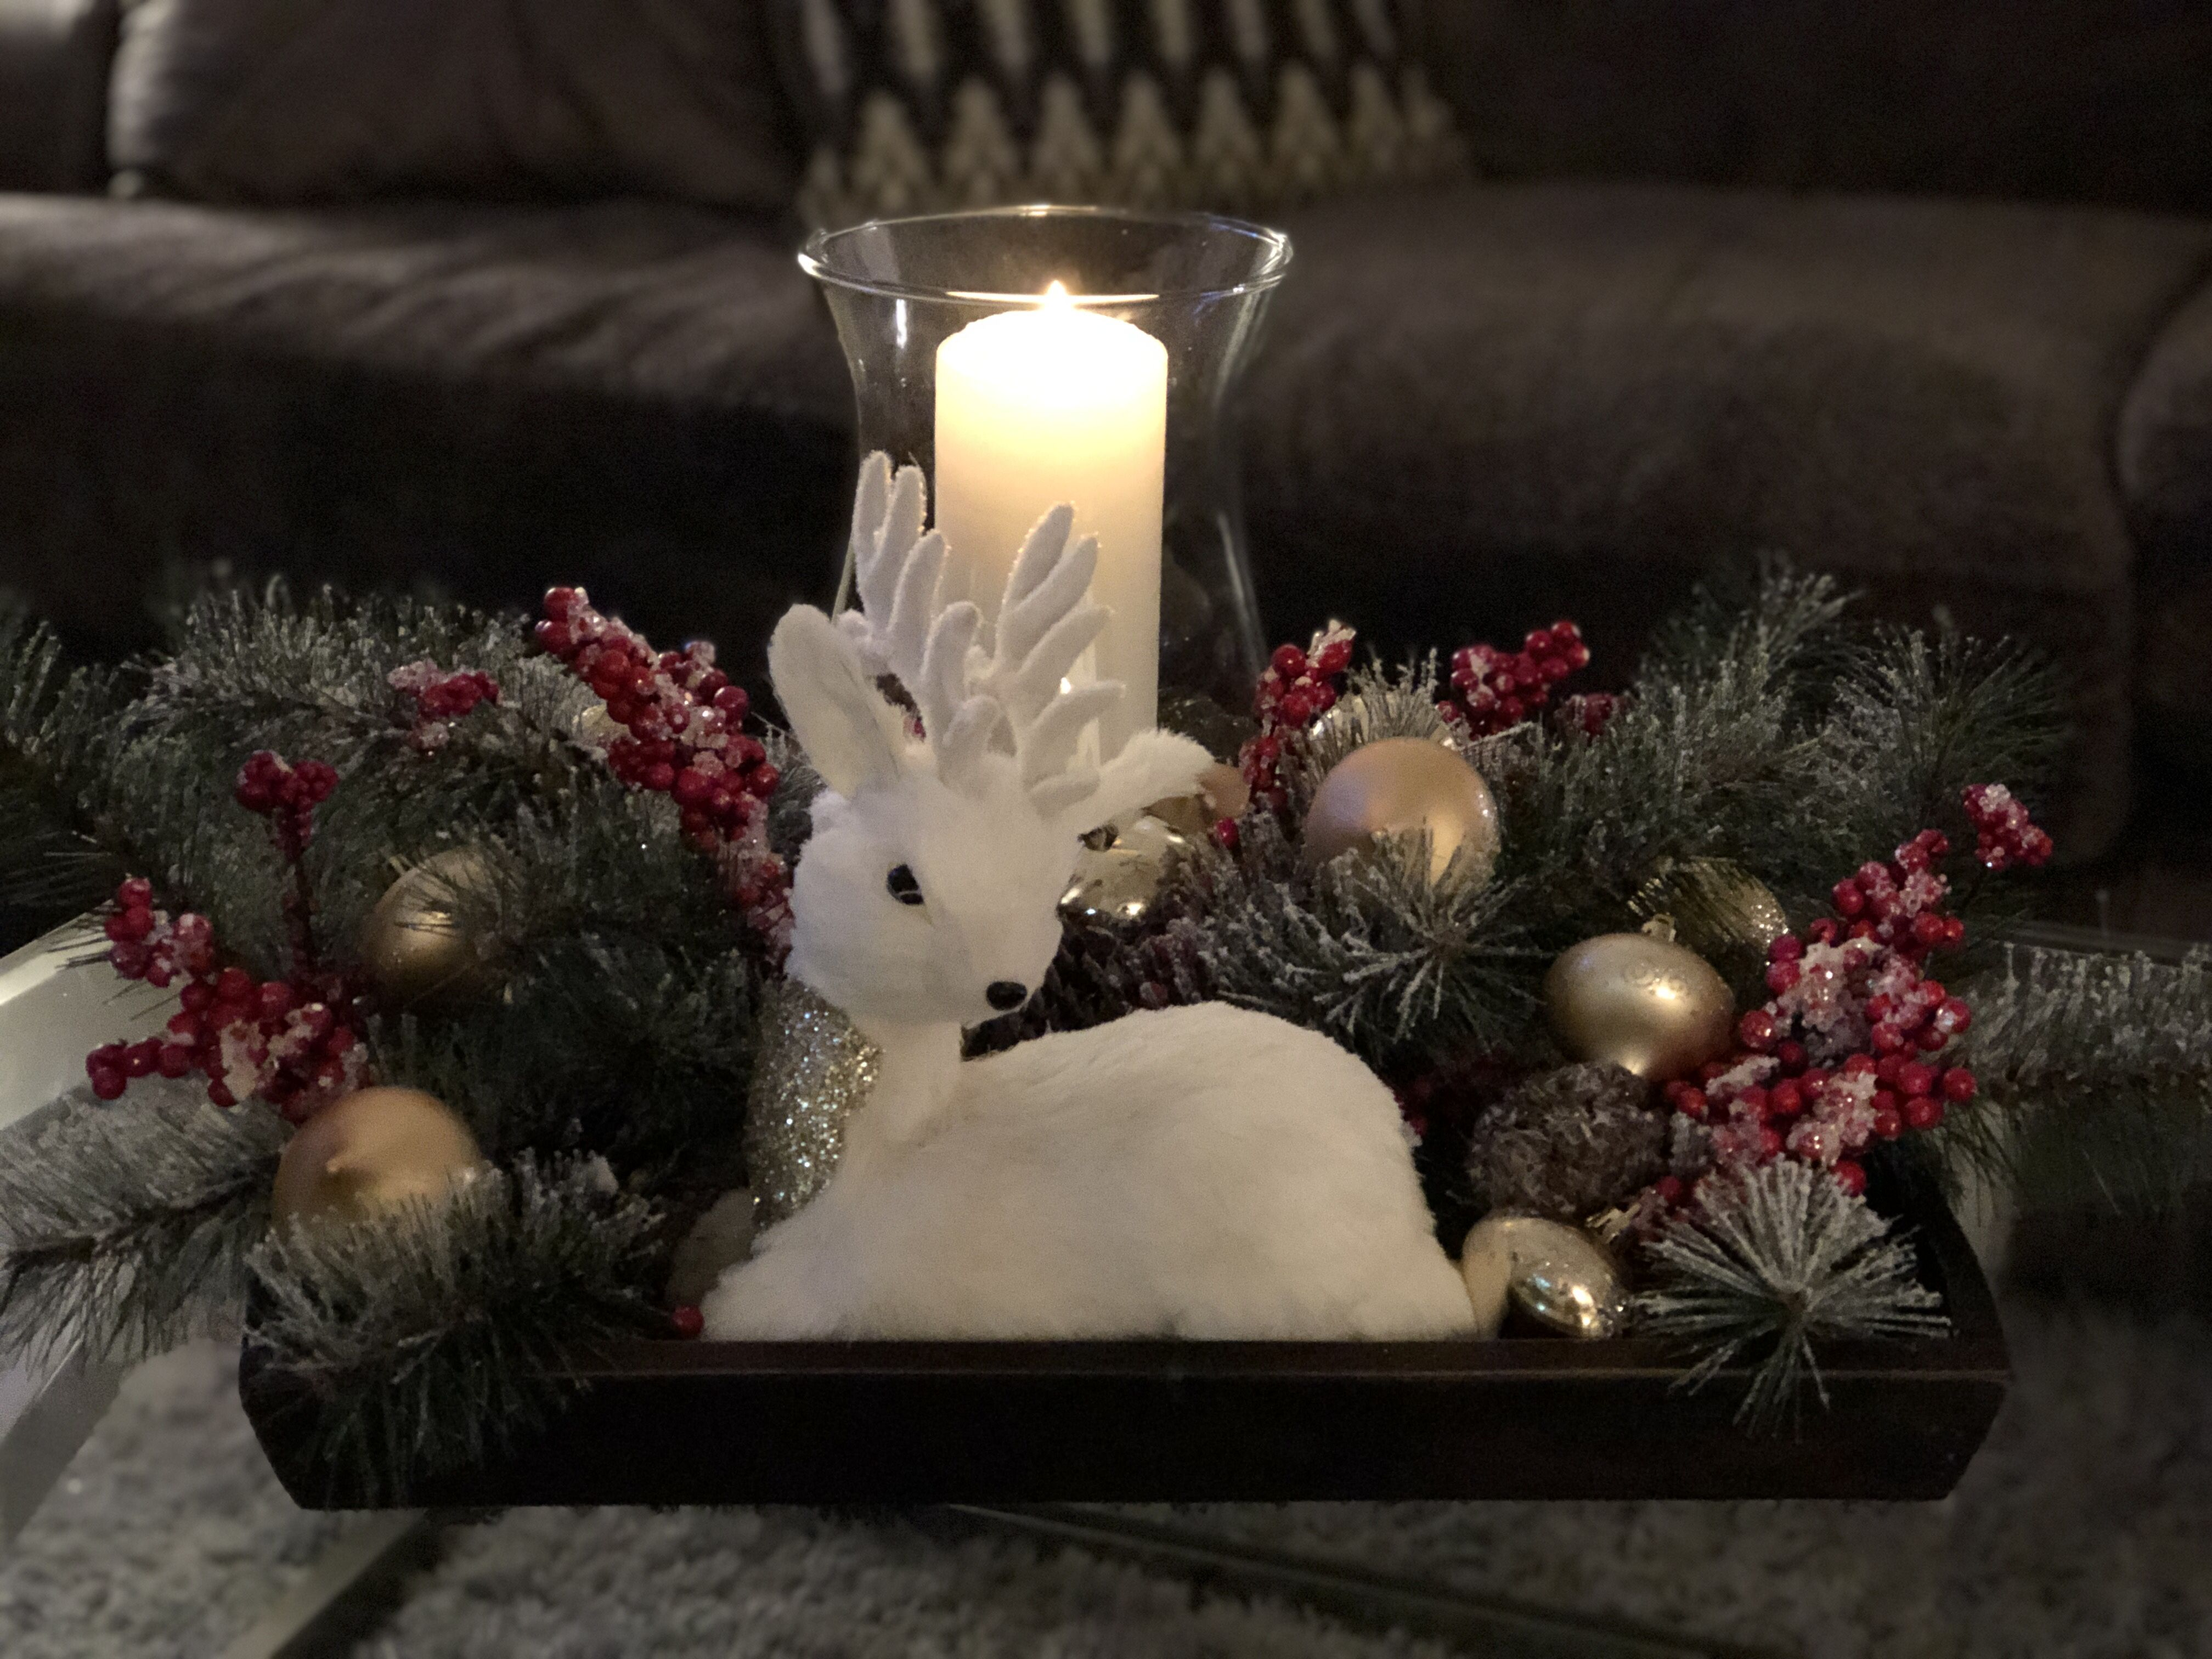 Christmas decorations for coffee table | Christmas coffee ...